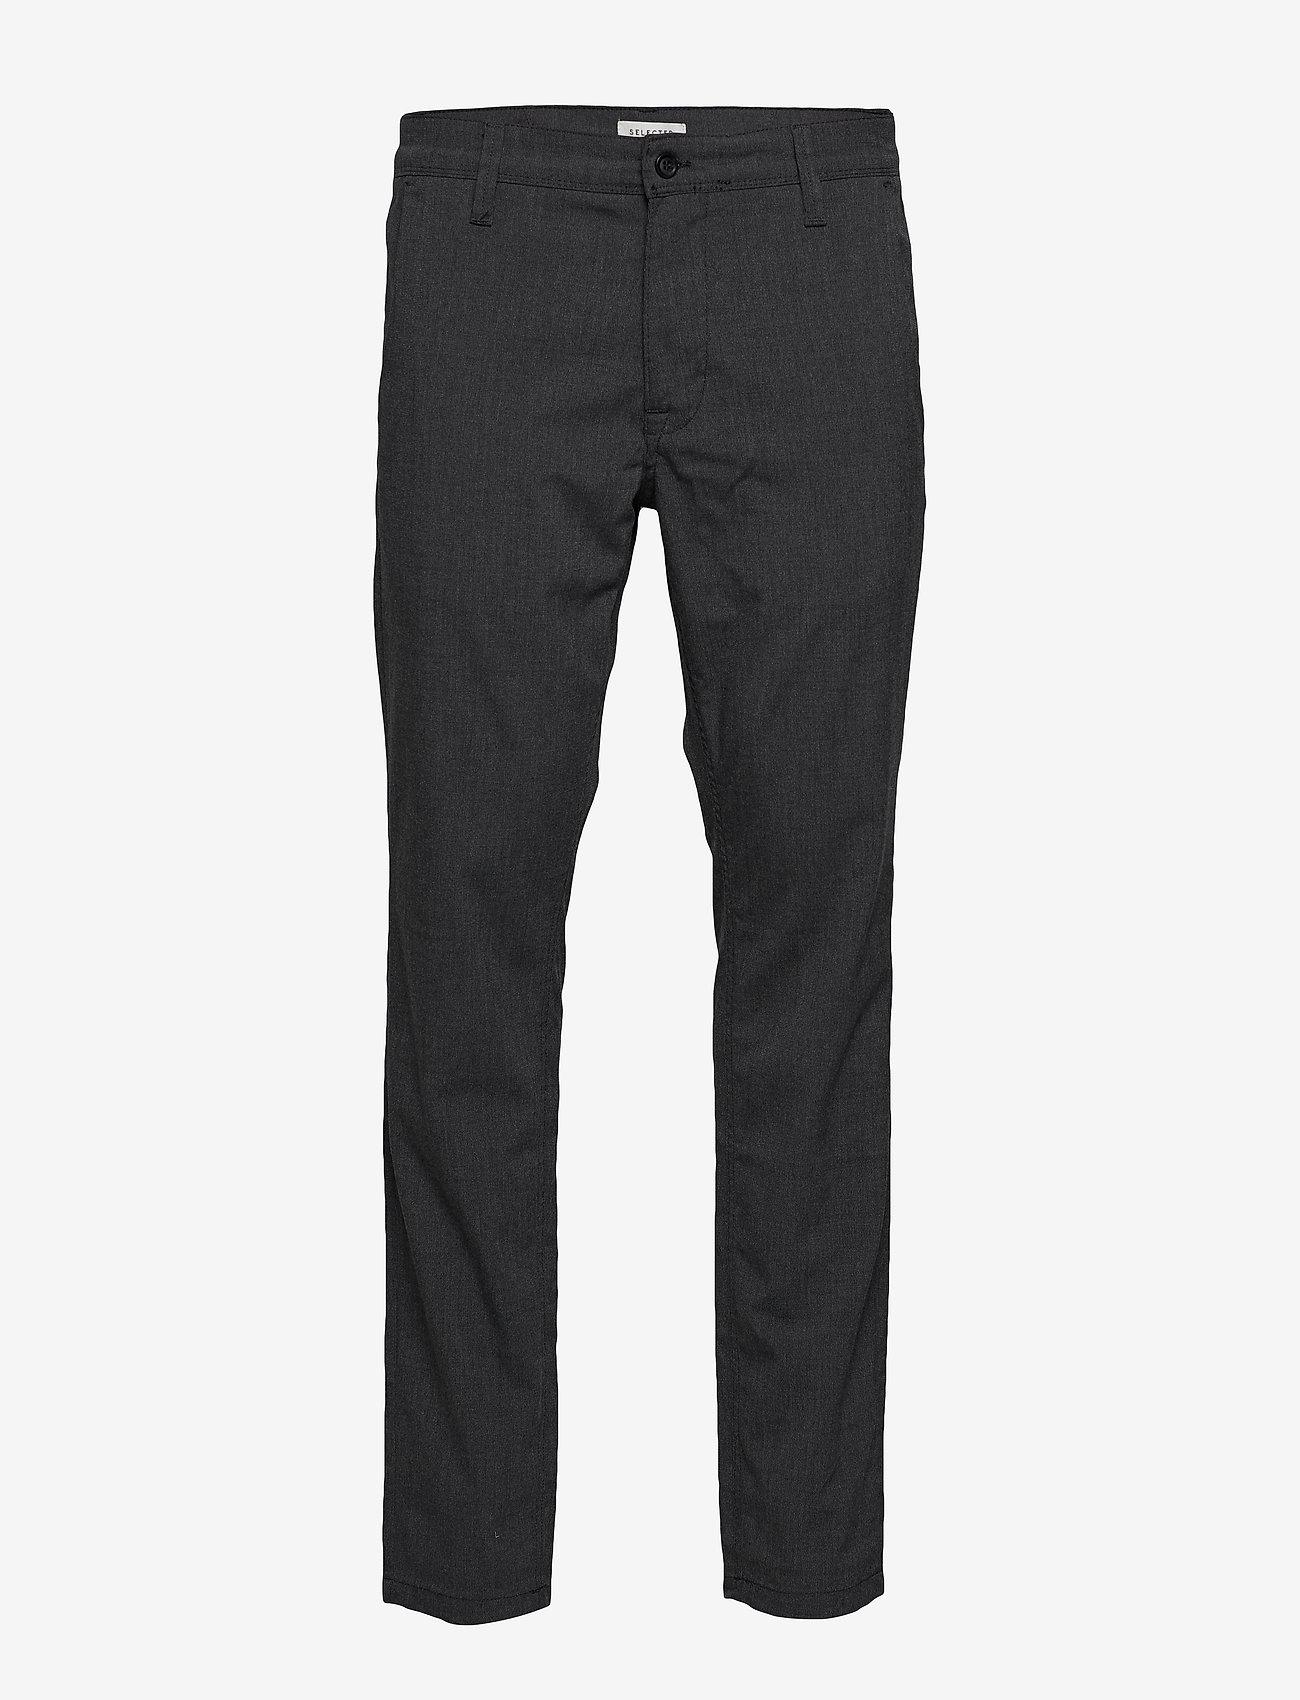 Selected Homme - SLHSLIM-STORM FLEX SMART PANTS W NOOS - suitbukser - grey melange - 0